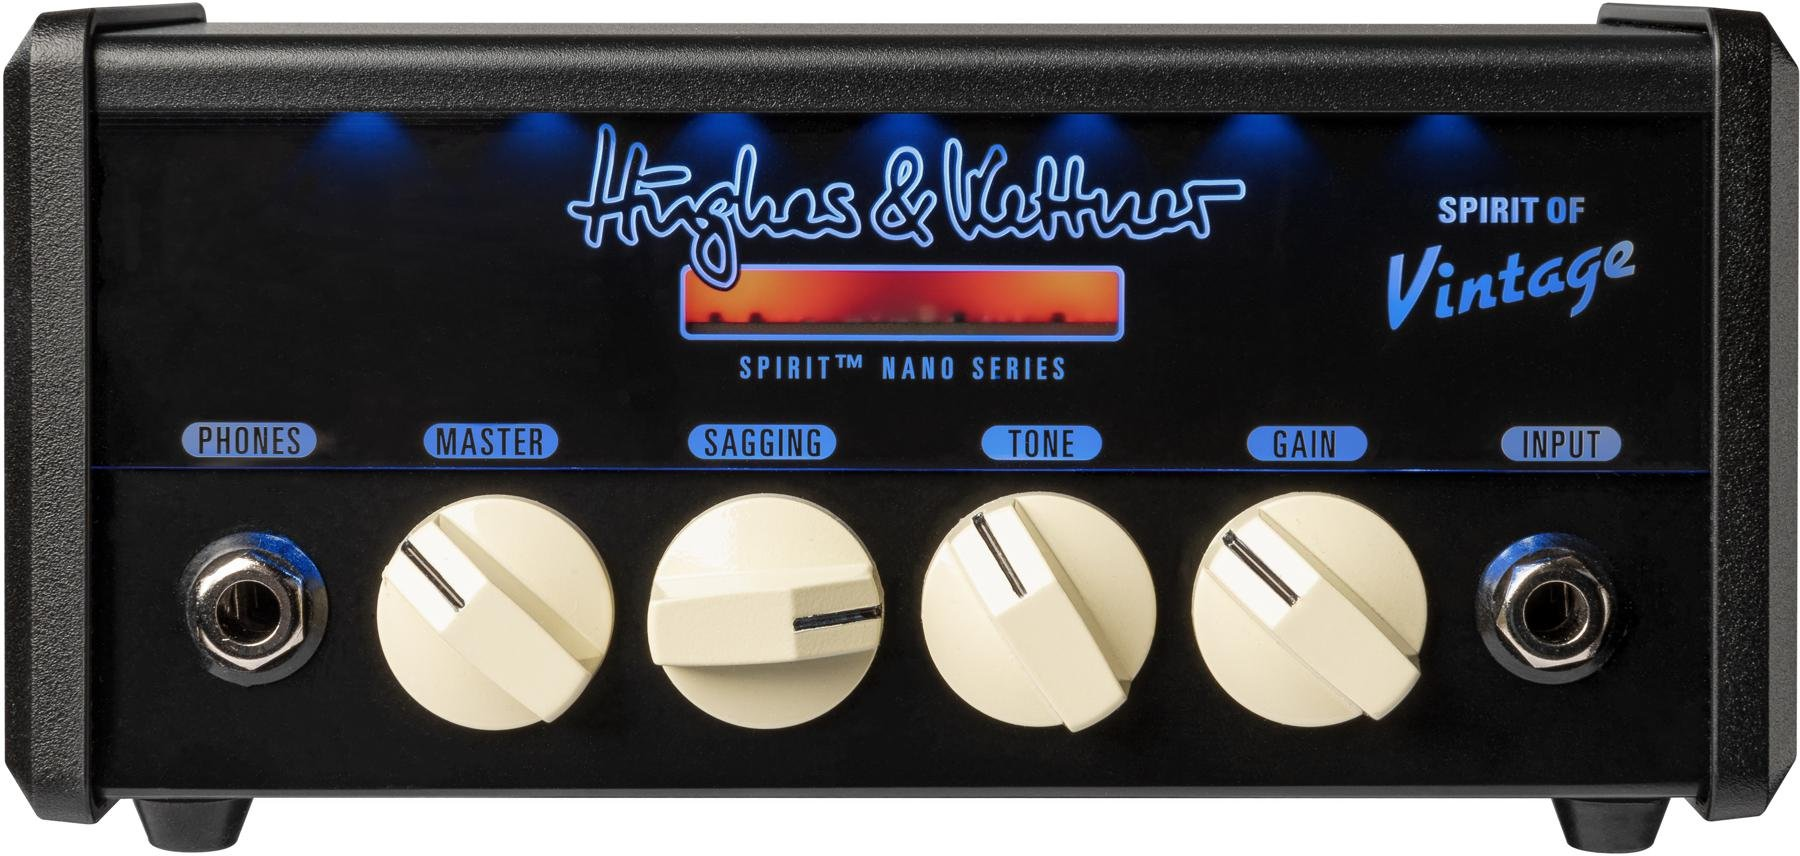 HUGHES & KETTNER SPIRIT NANO HEAD - SPIRIT OF VINTAGE - Chitarre Amplificatori - Testate